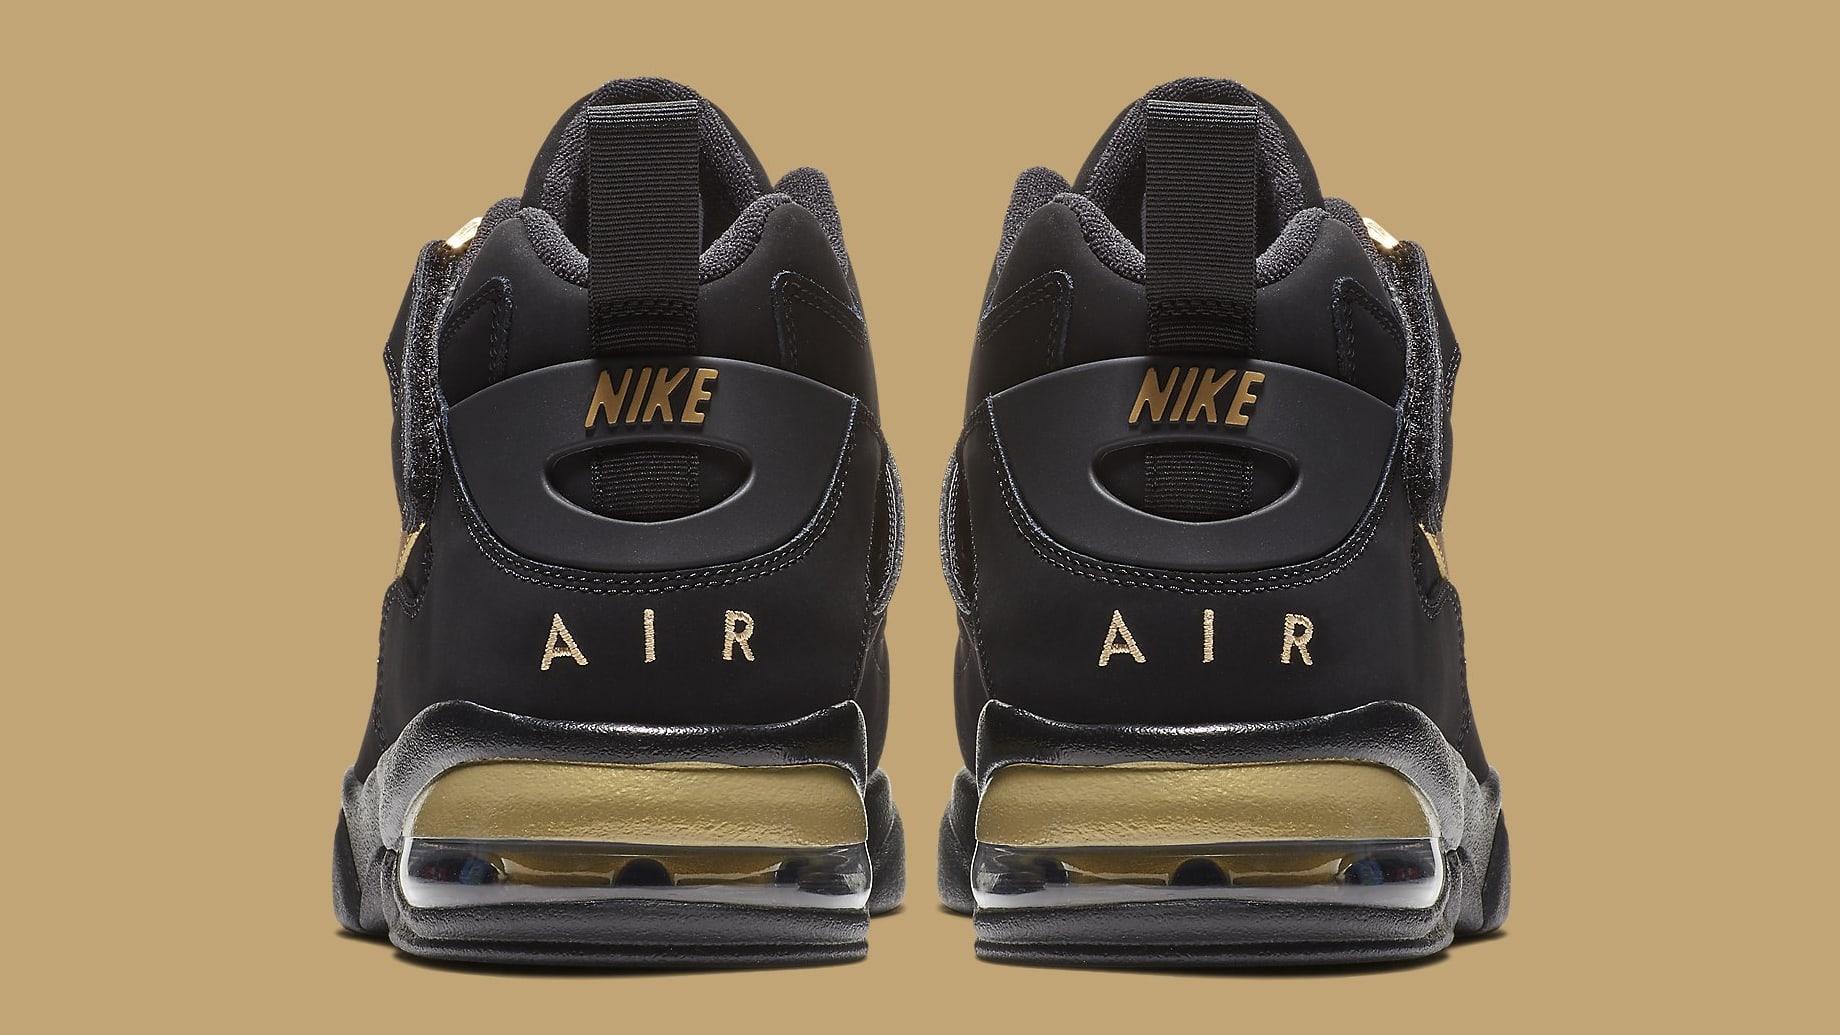 nike-air-force-max-cb-metallic-gold-aj7922-001-heel